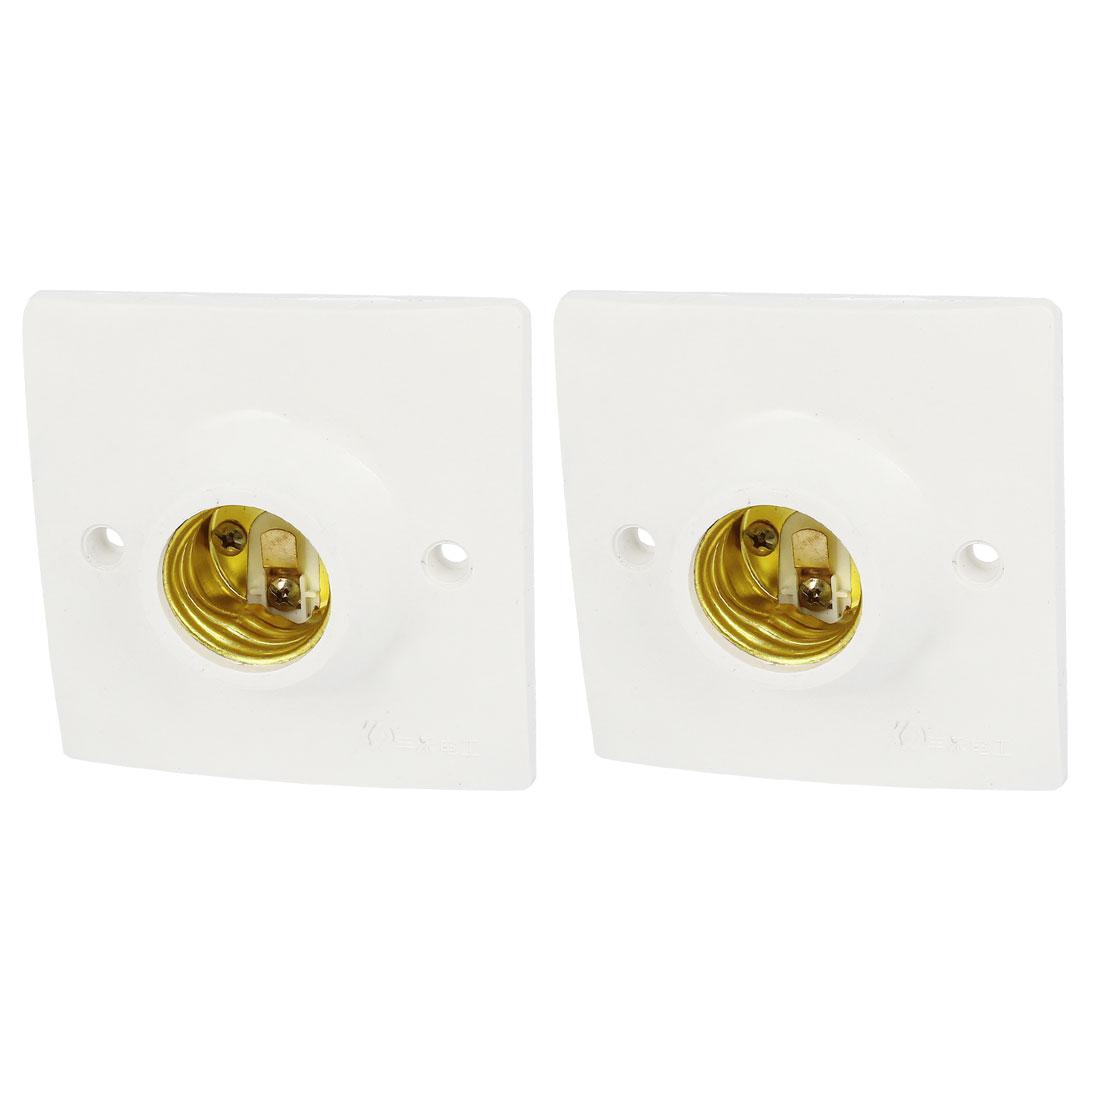 Wall Ceiling E26 Socket LED Halogen CFL Light Lamp Bulb Adapter Holder 2pcs